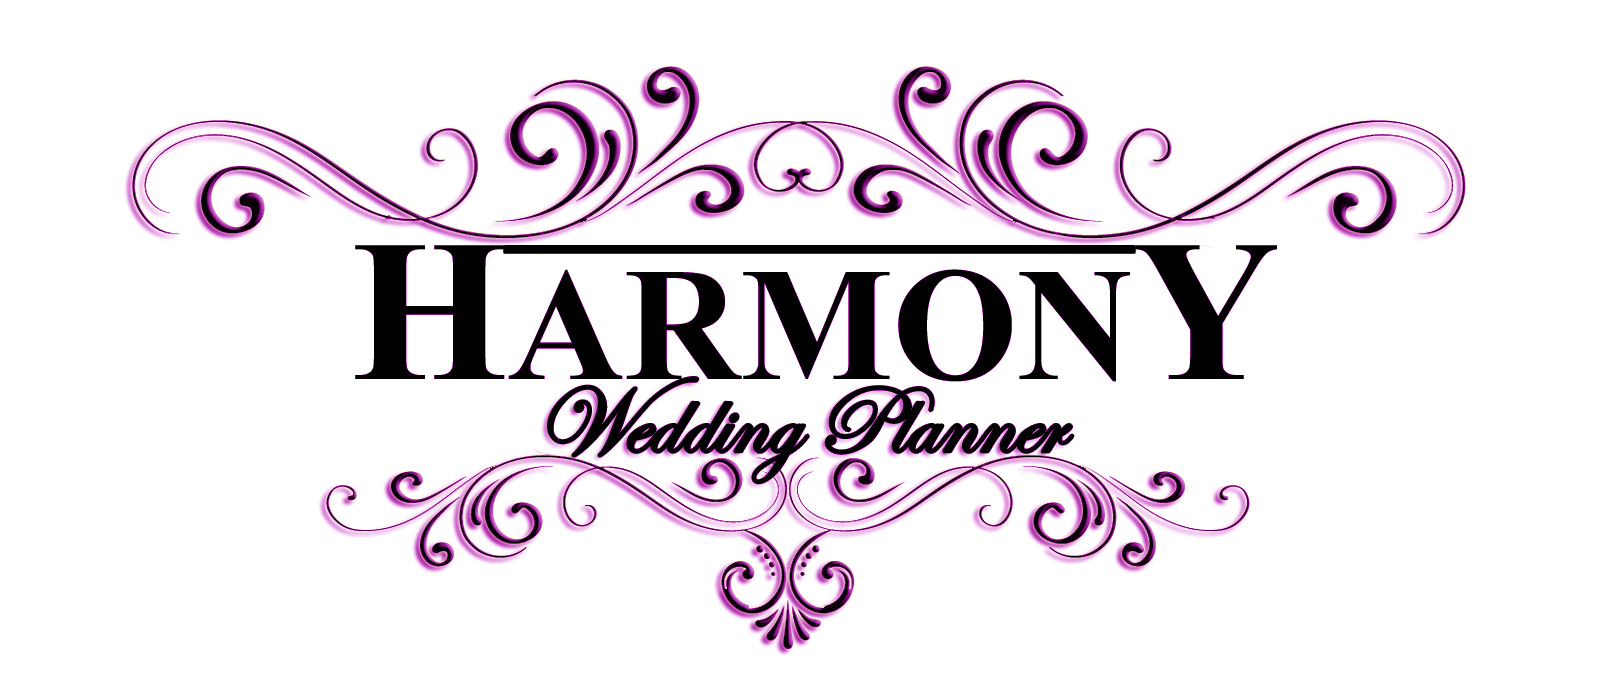 Harmony Wedding Planner